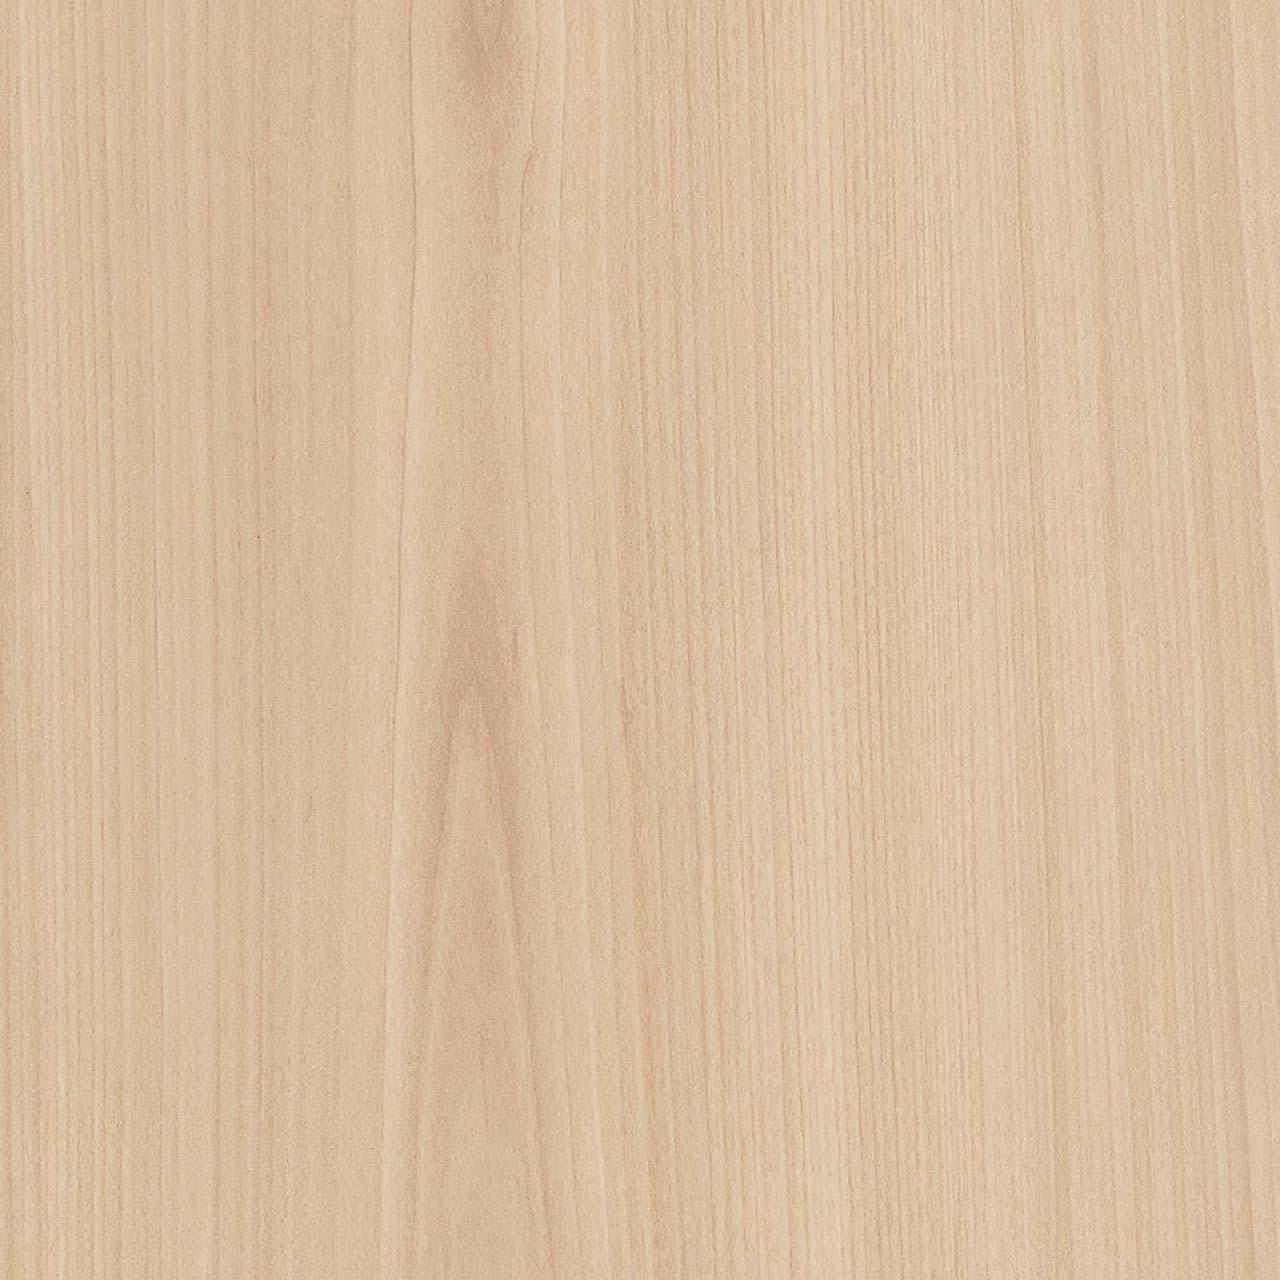 Swiss Pear effect laminate panel